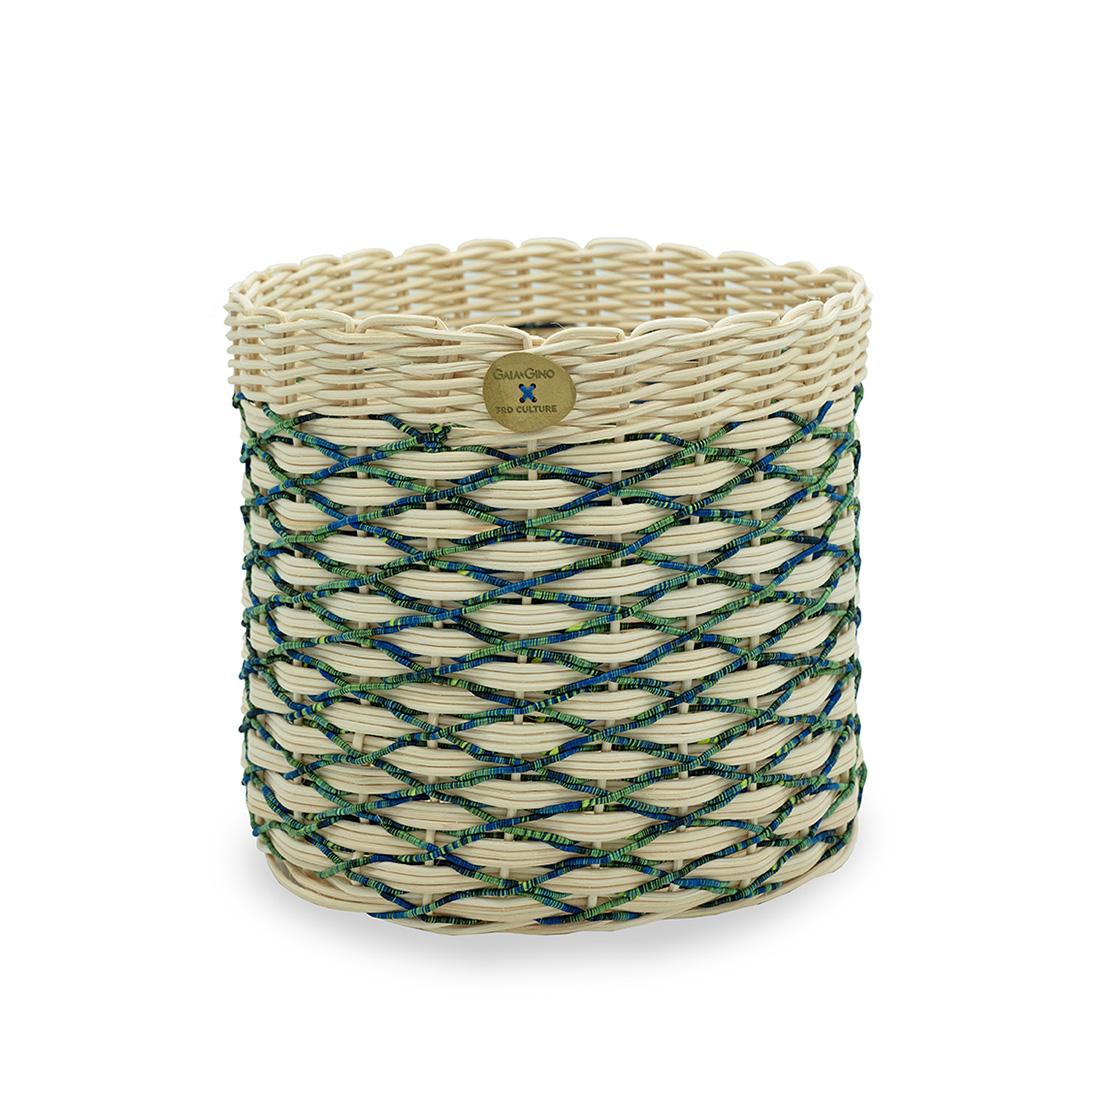 Alge Basket, Small